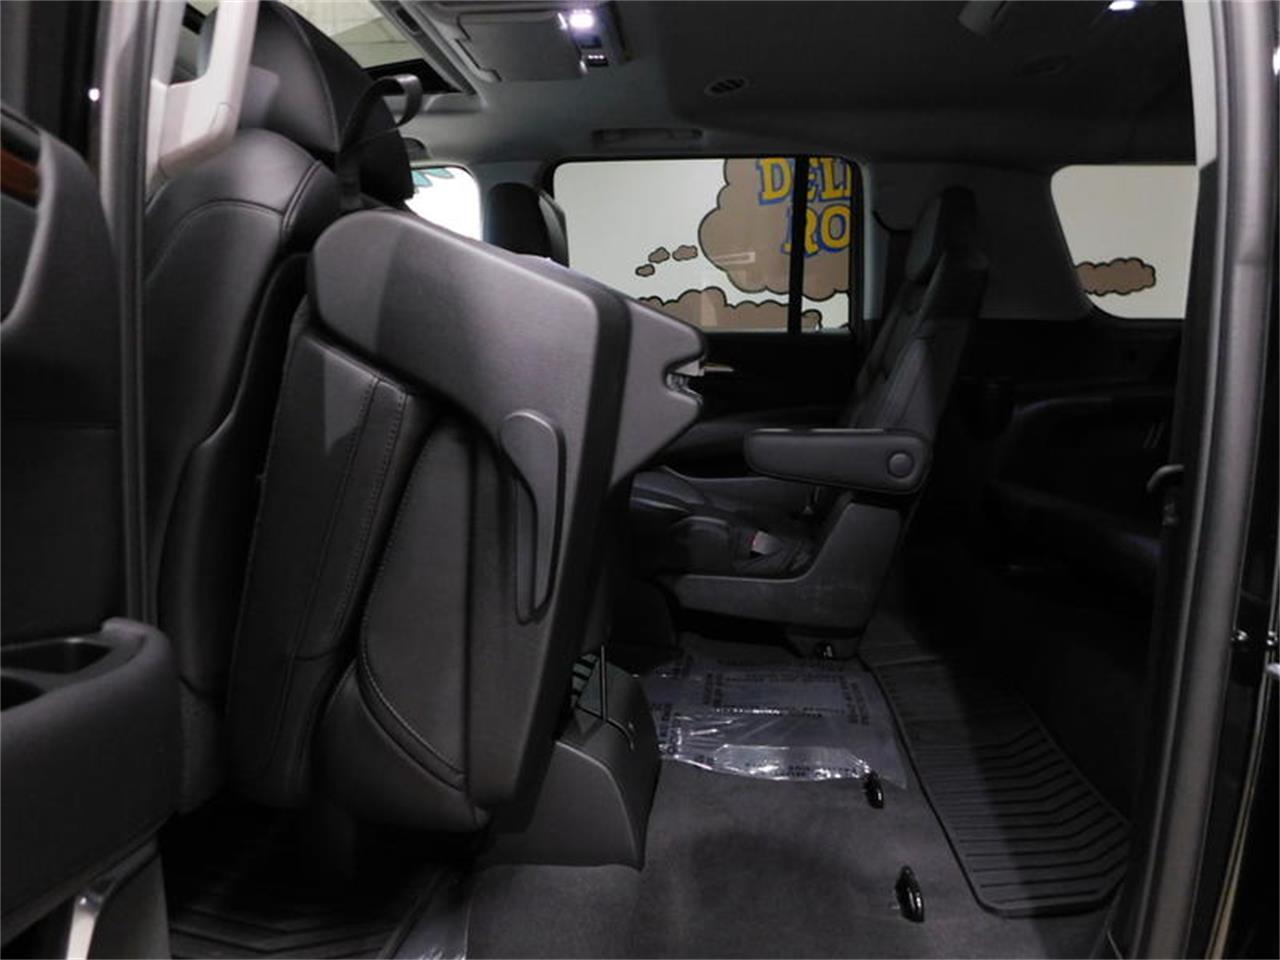 2018 Cadillac Escalade (CC-1295261) for sale in Hamburg, New York